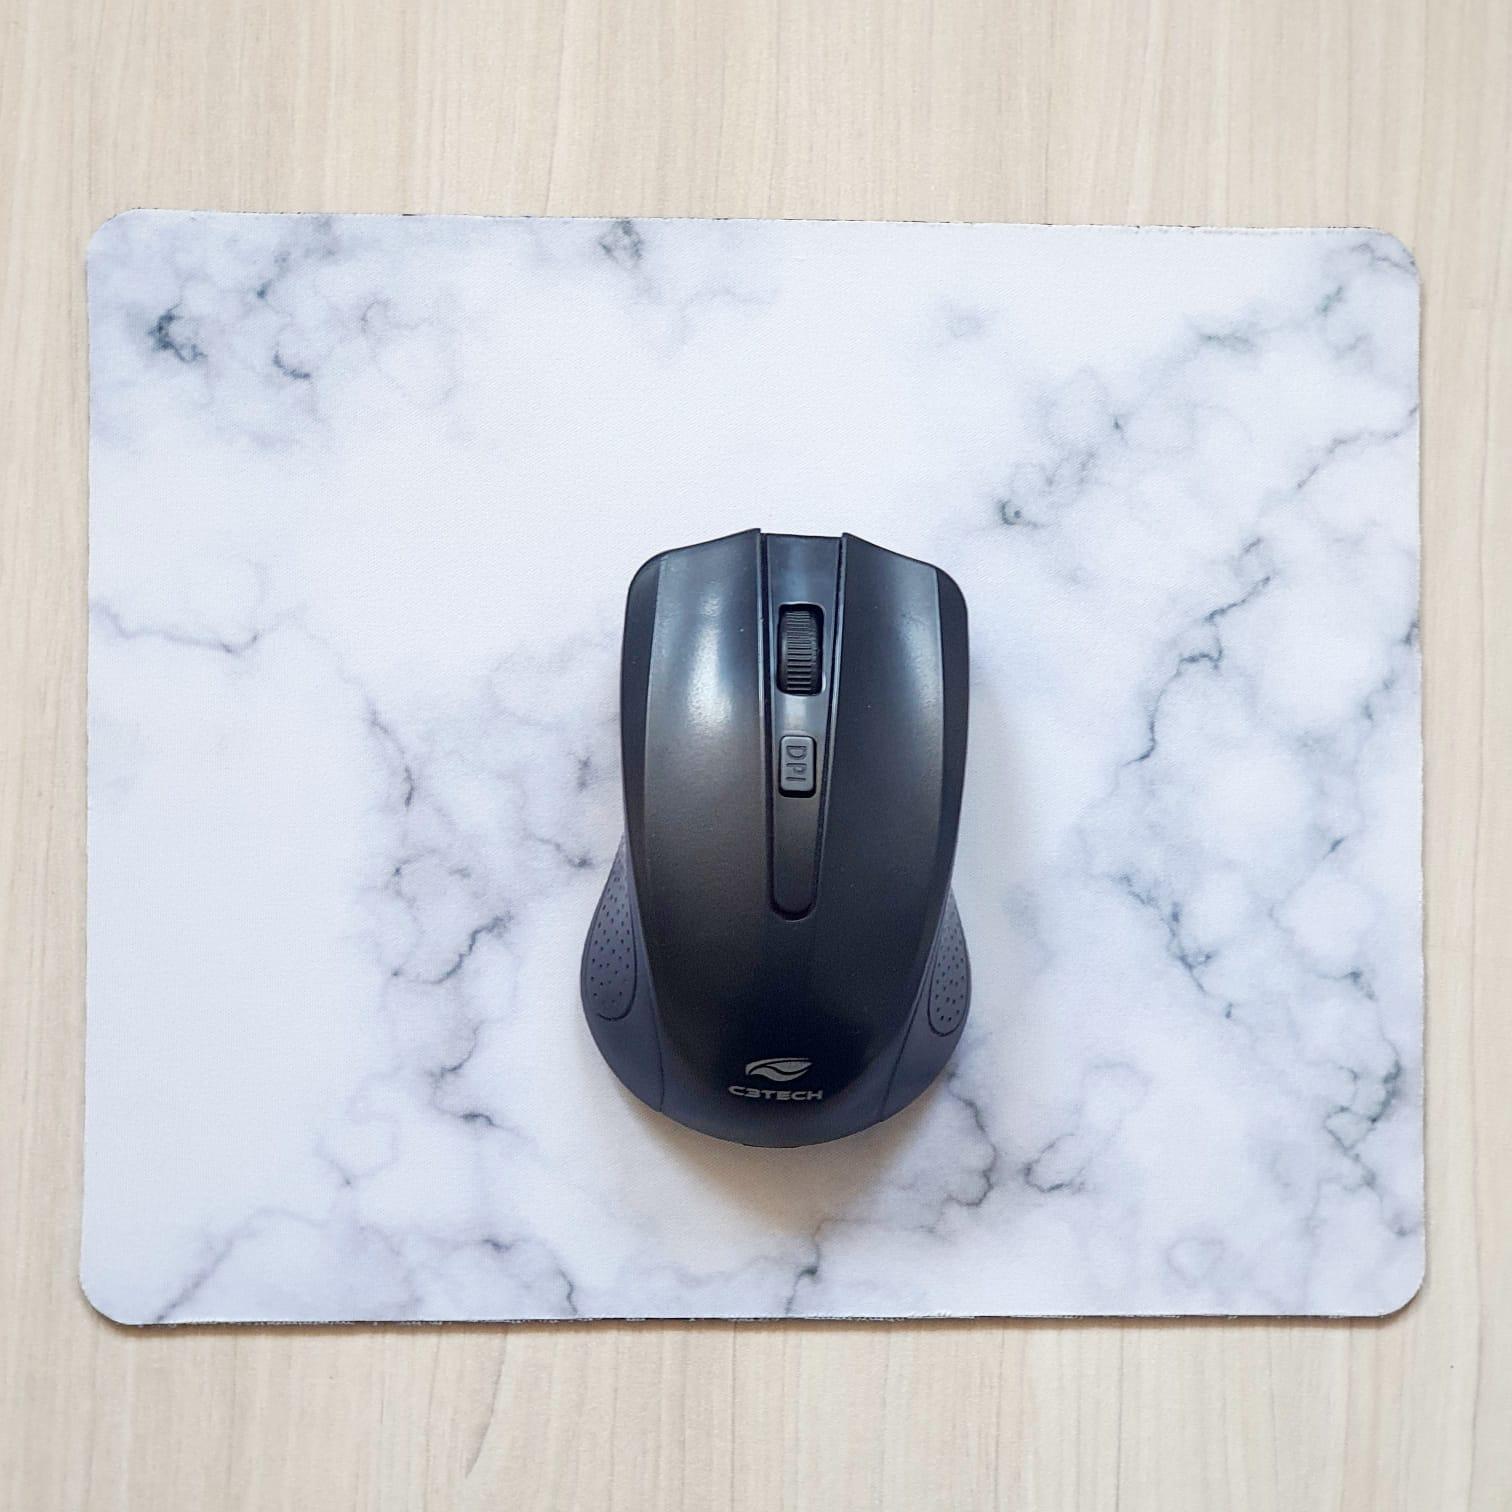 Mouse Pad Estampa Marmorizada 23x19cm